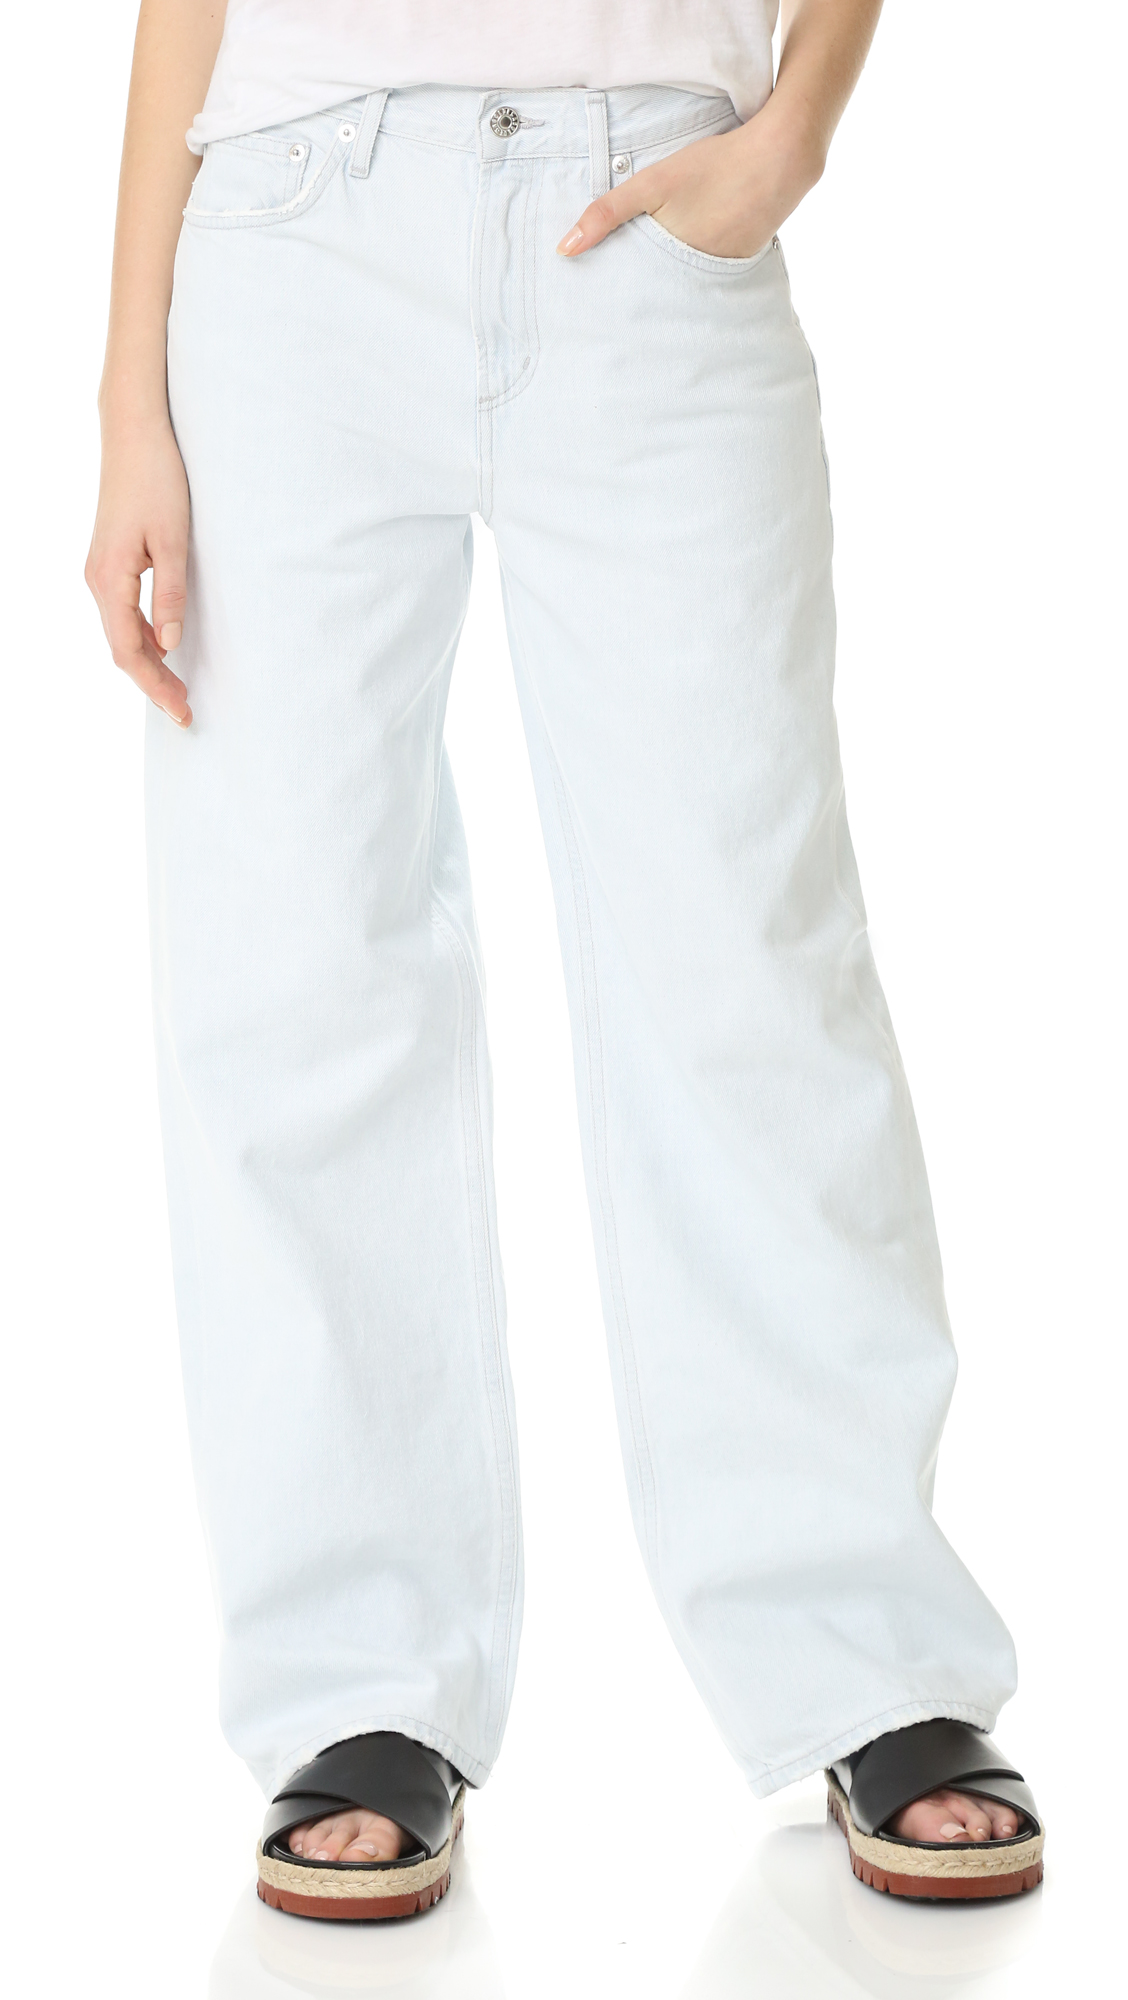 Agolde Alana Oversized Straight Leg Jeans - Borderline at Shopbop